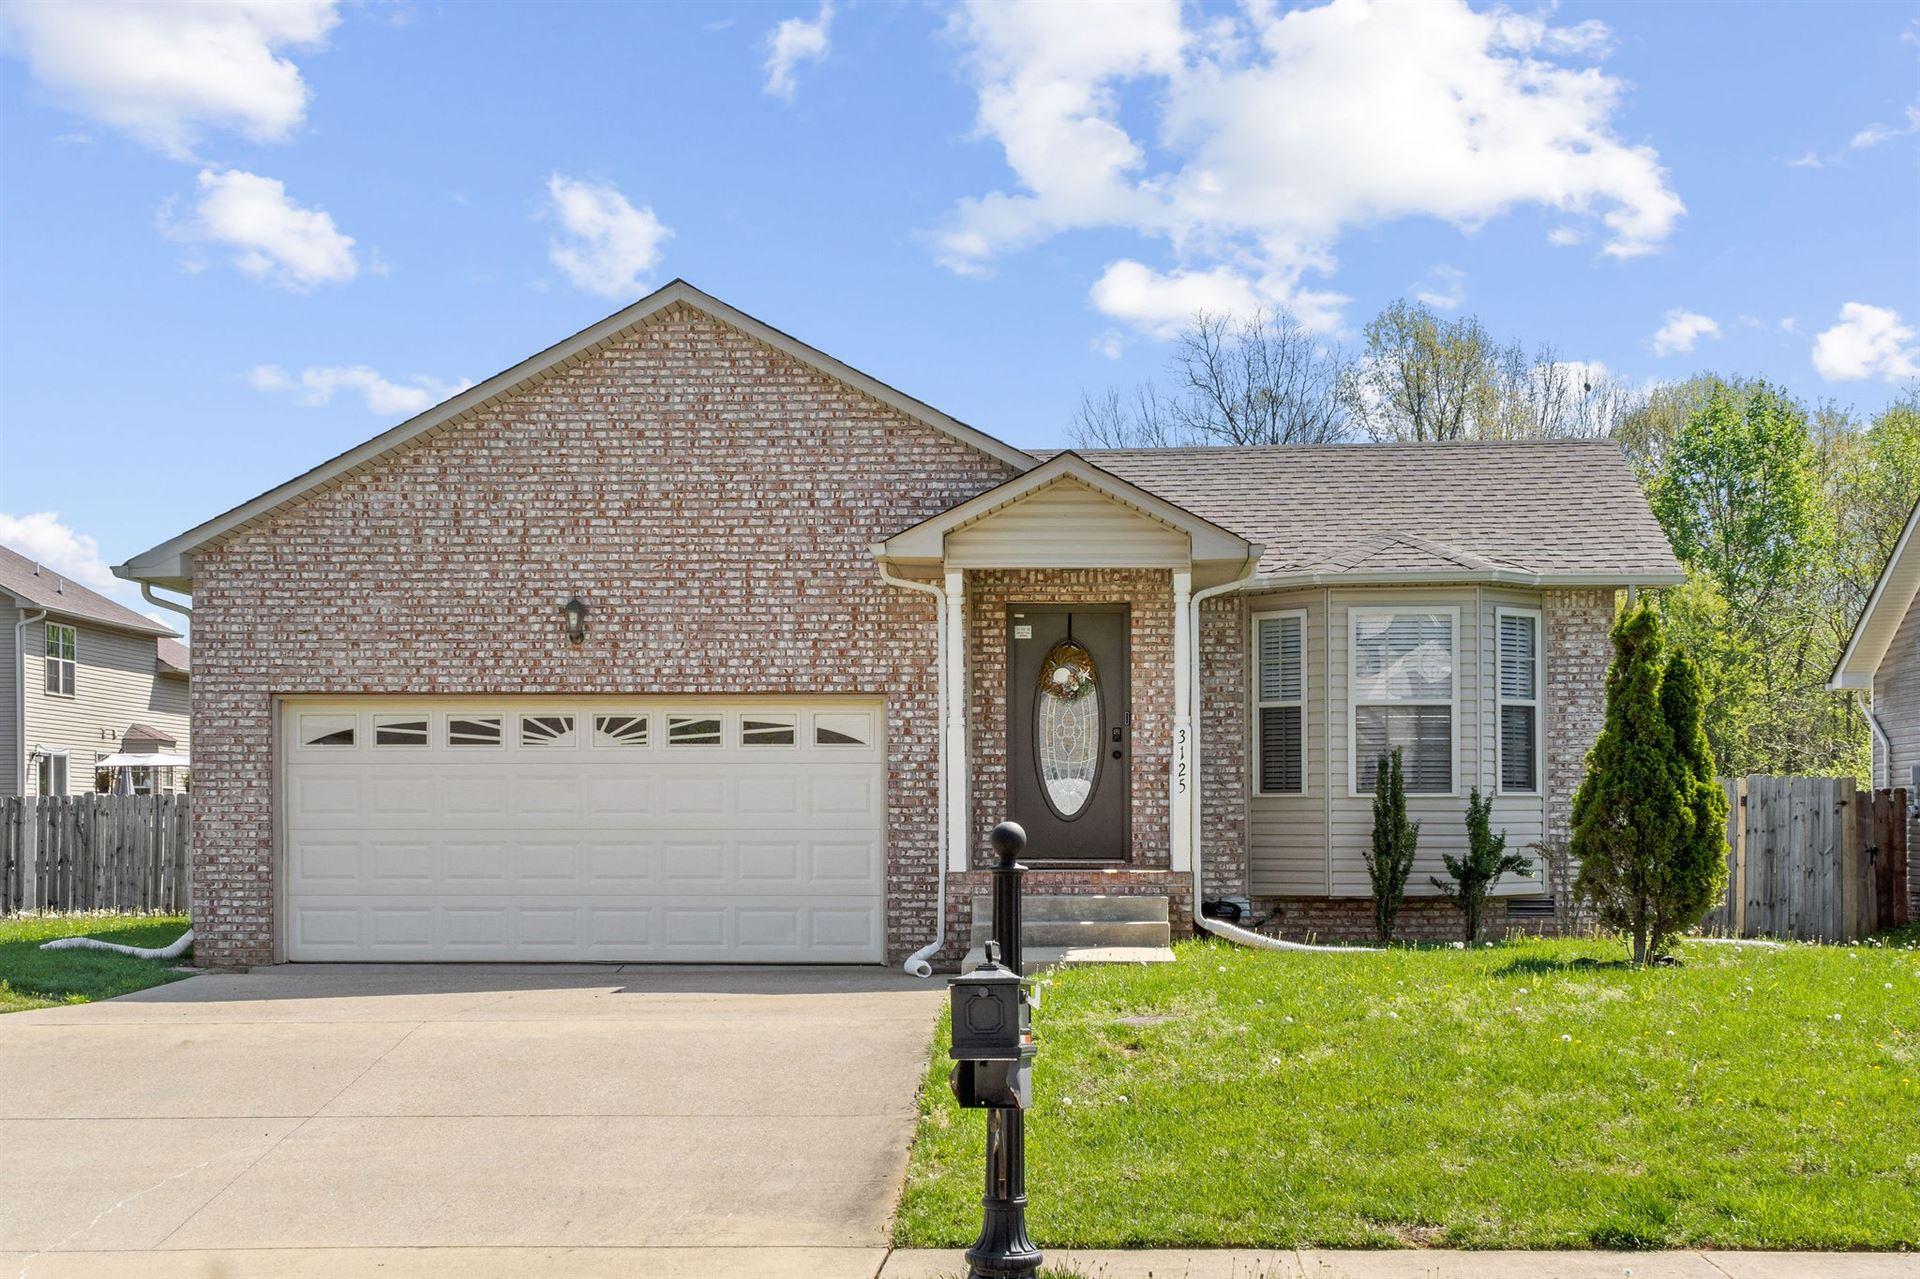 3125 Twelve Oaks Blvd, Clarksville, TN 37042 - MLS#: 2244159